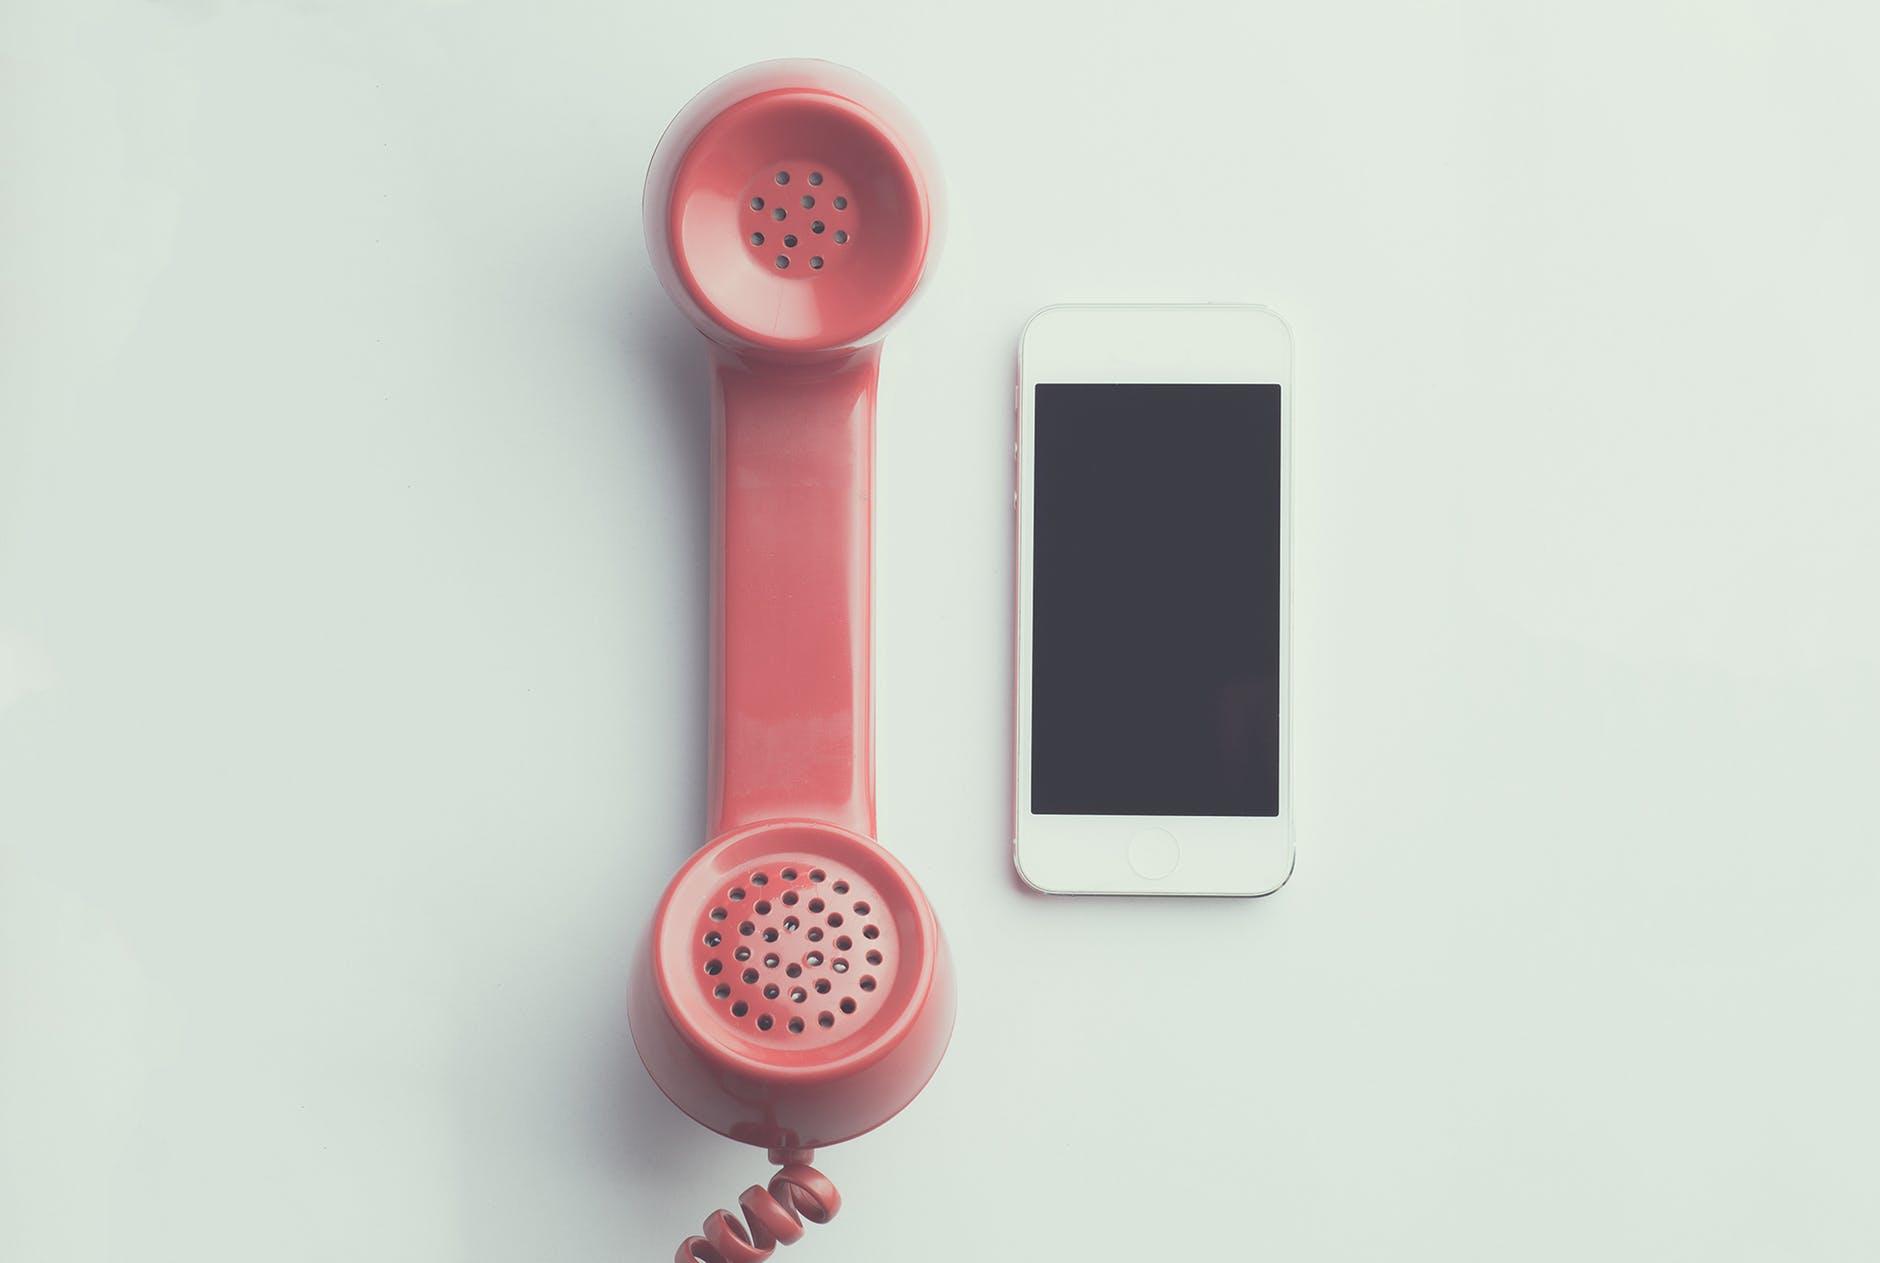 phones.jpeg